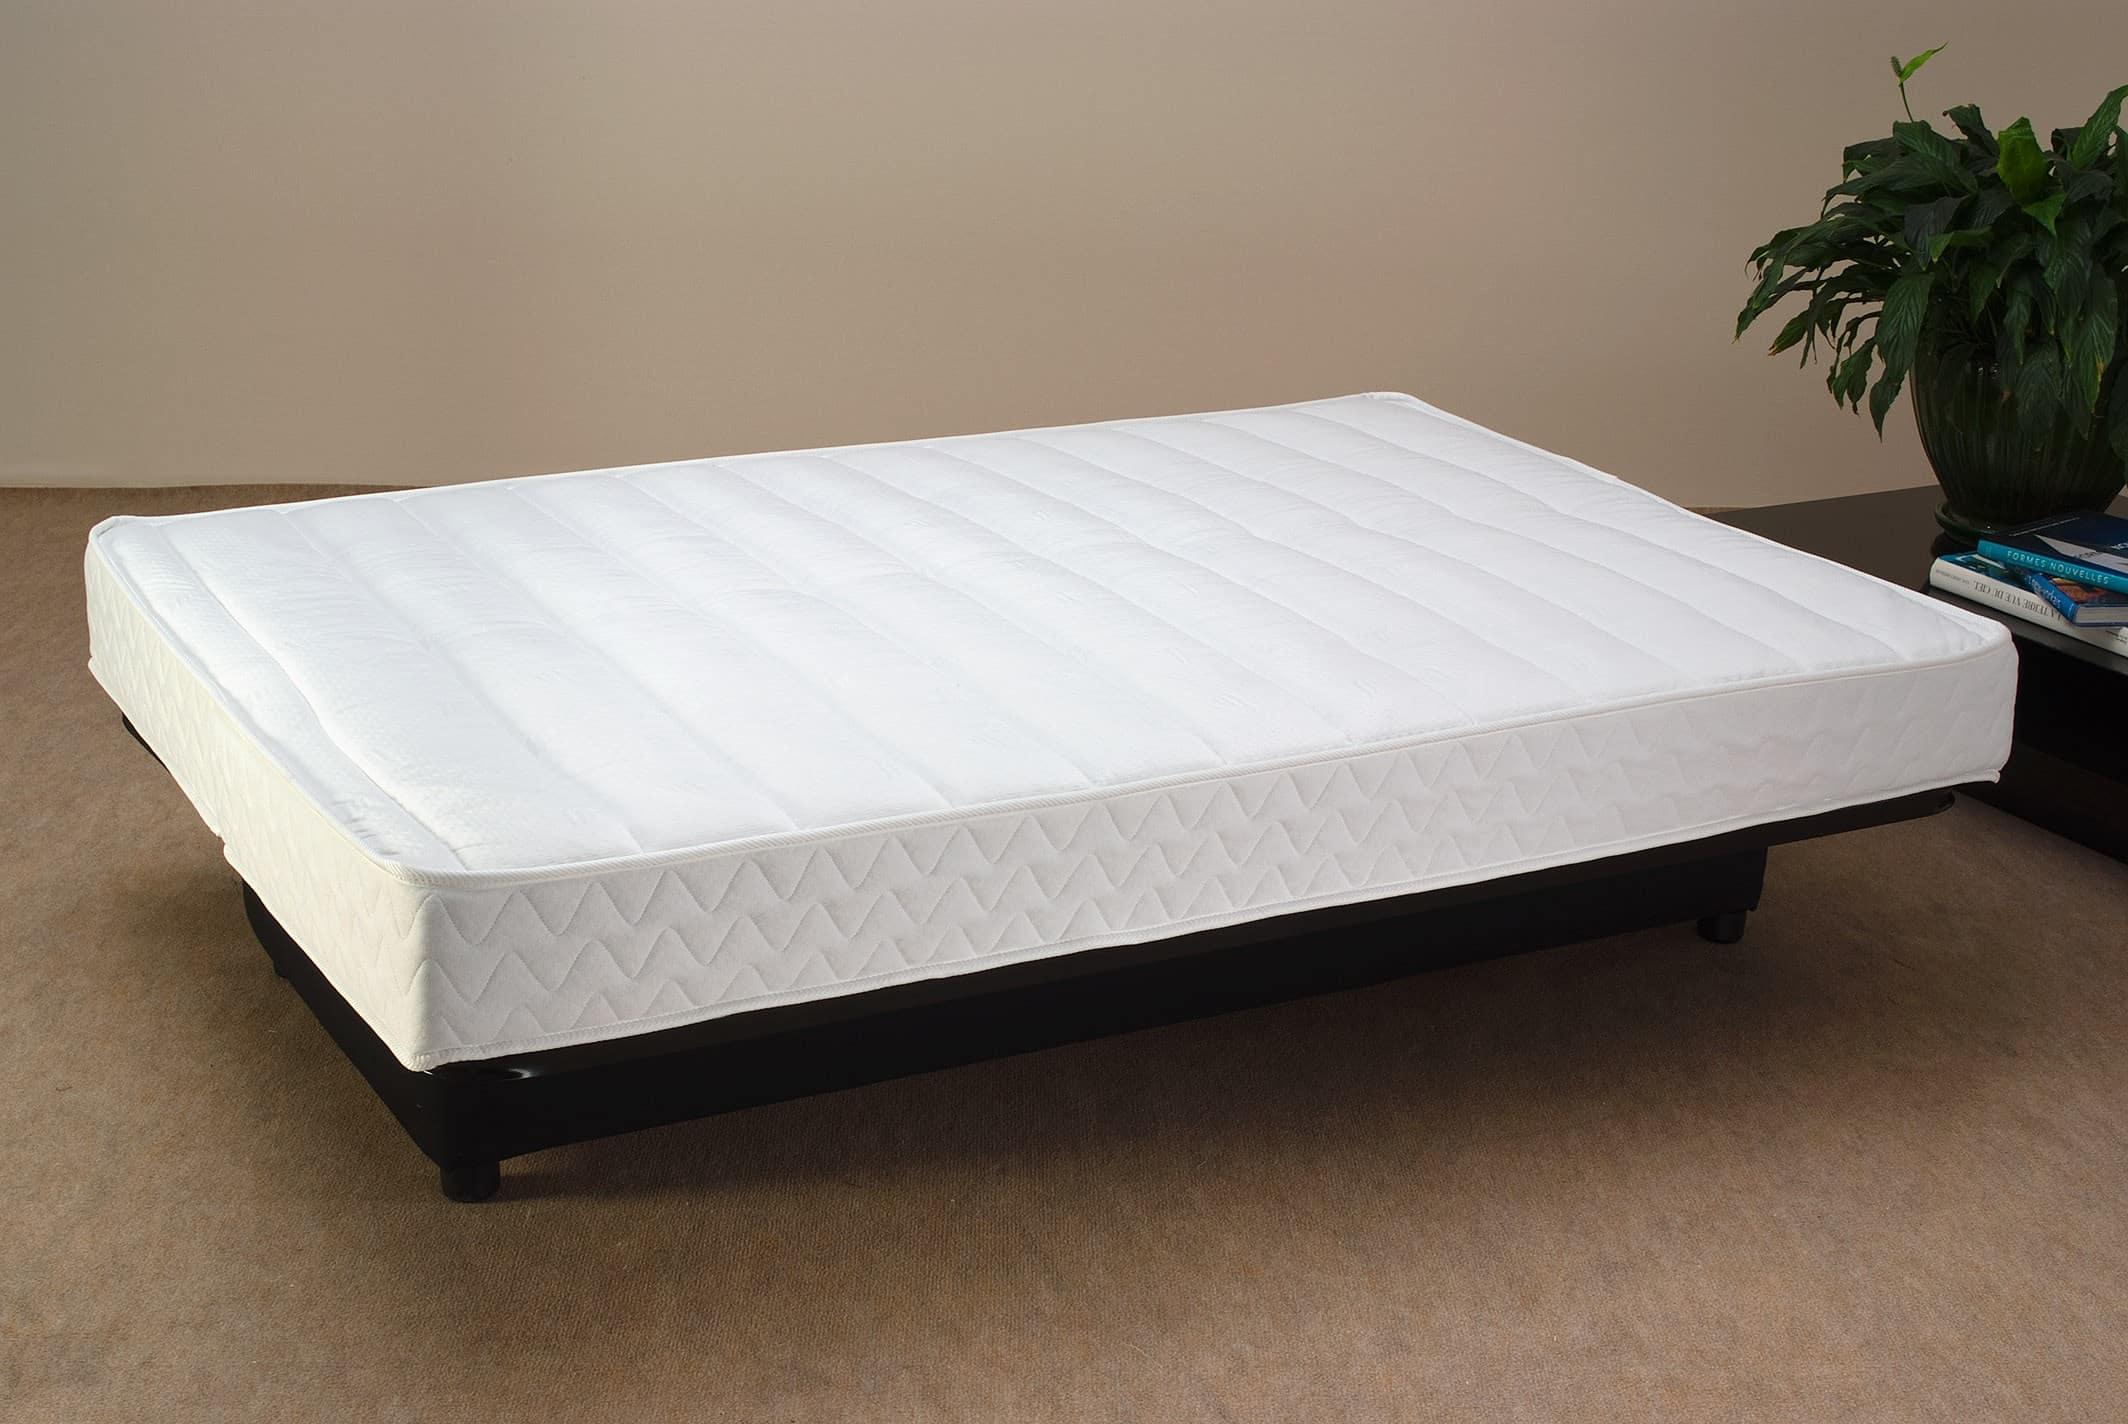 clic clac haute densite hoze home. Black Bedroom Furniture Sets. Home Design Ideas